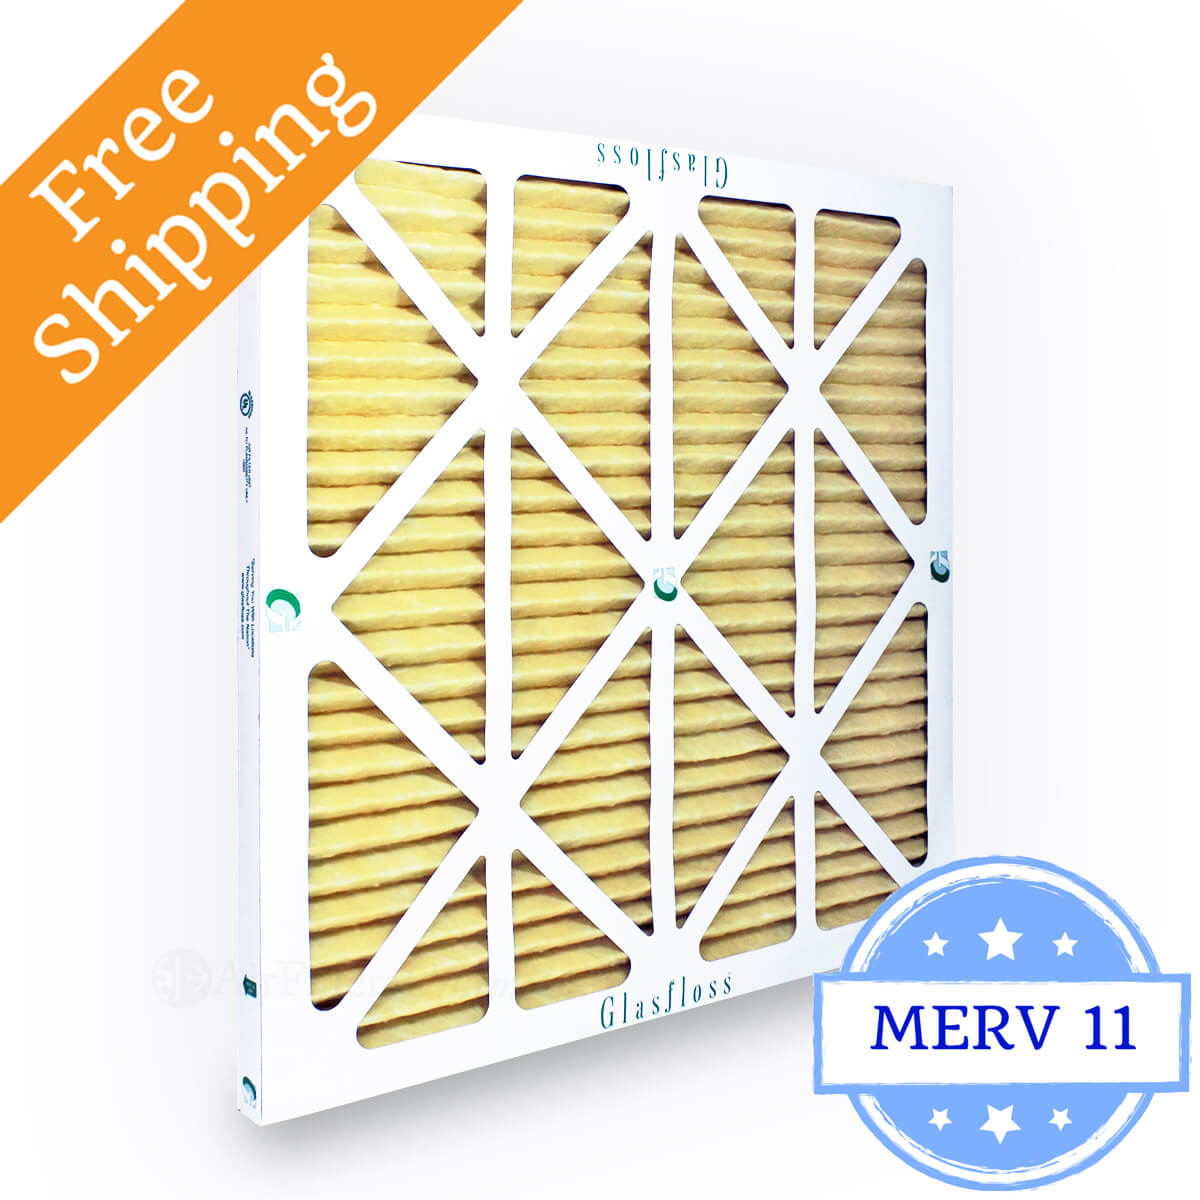 Glasfloss 16x16x1 Air Filter MR-11 Series